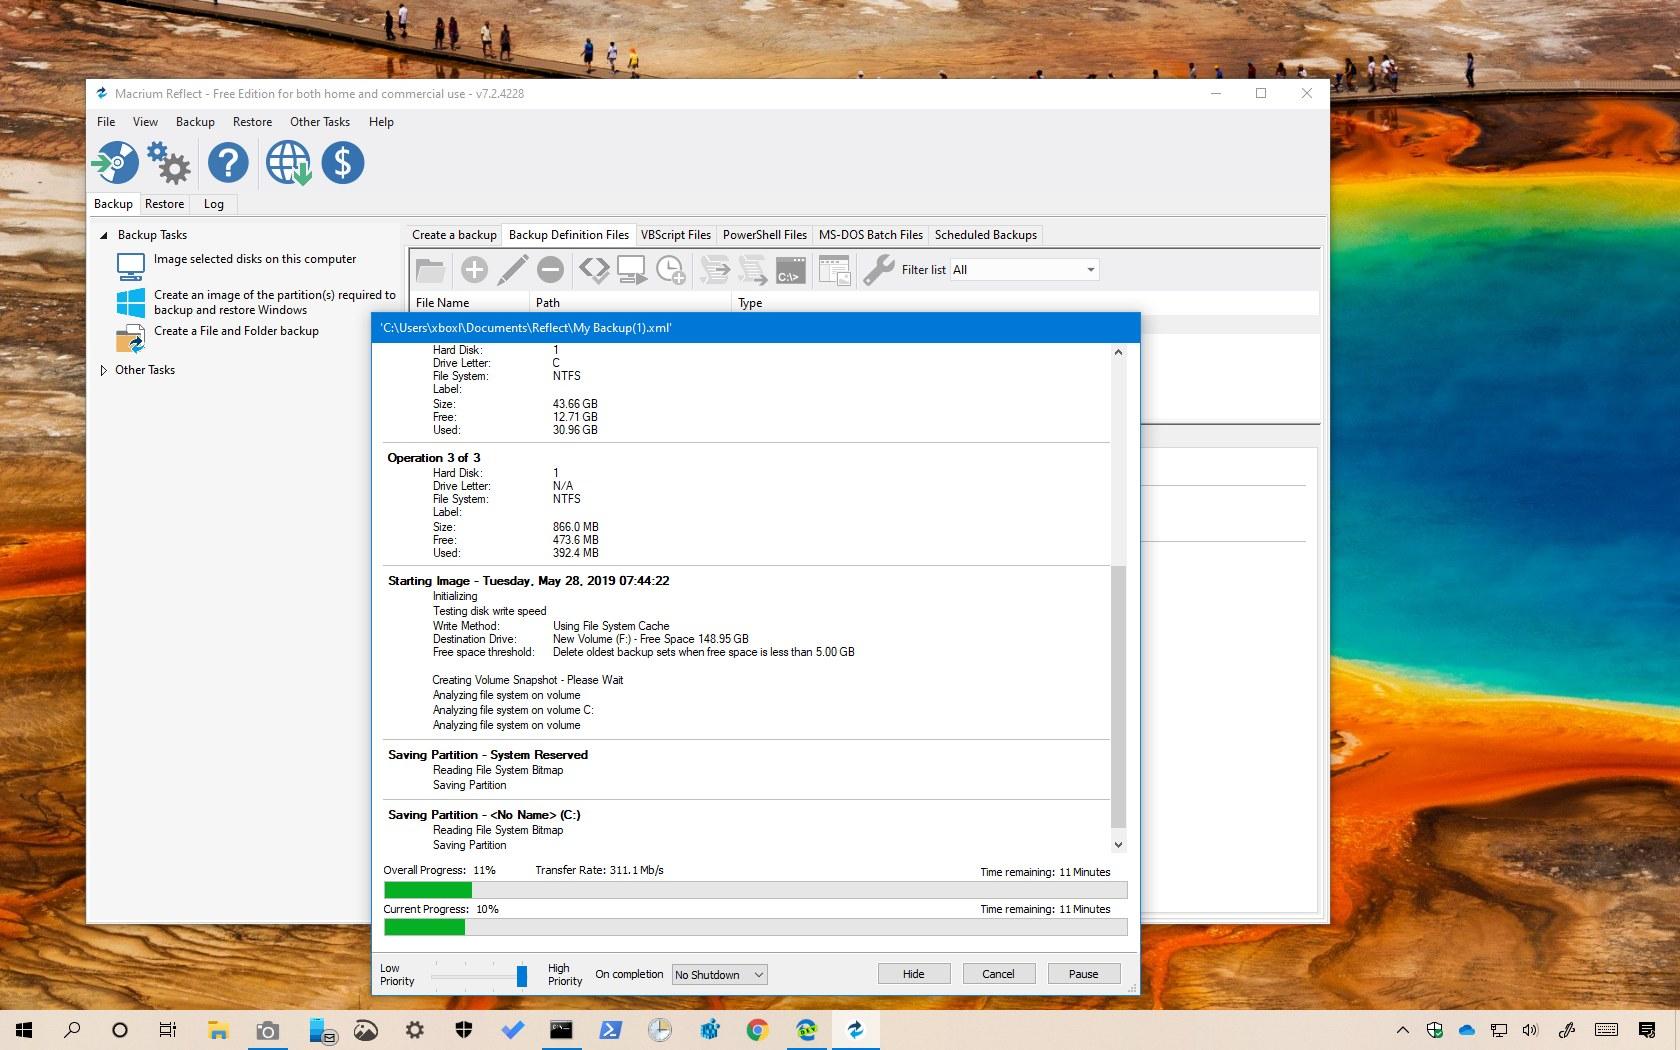 Windows 10 full backup using Macrium Reflect